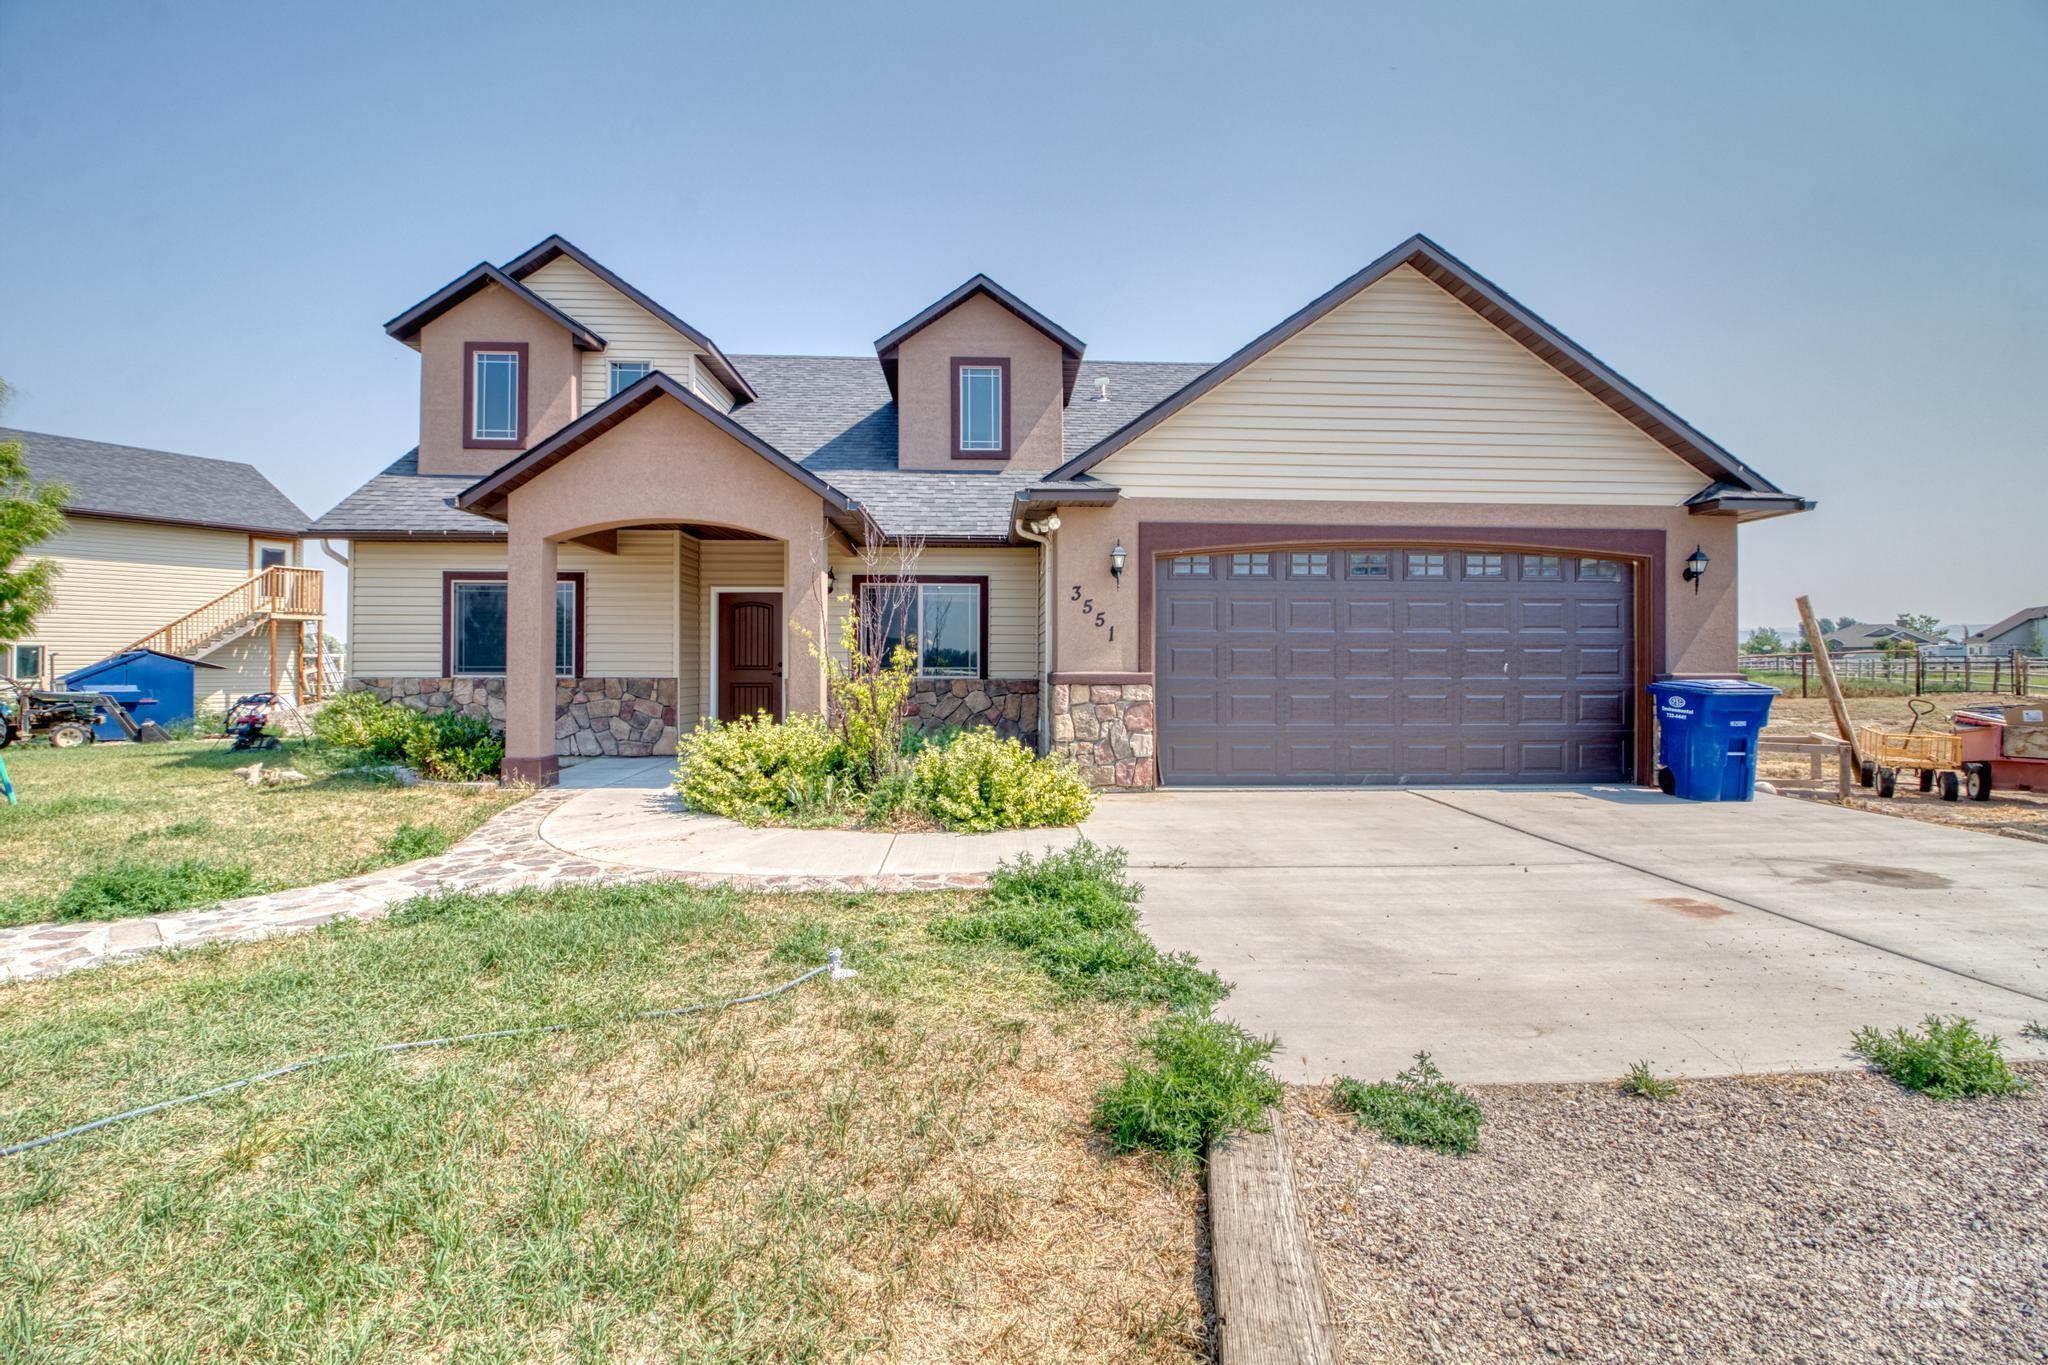 3551 E 3144 N Property Photo